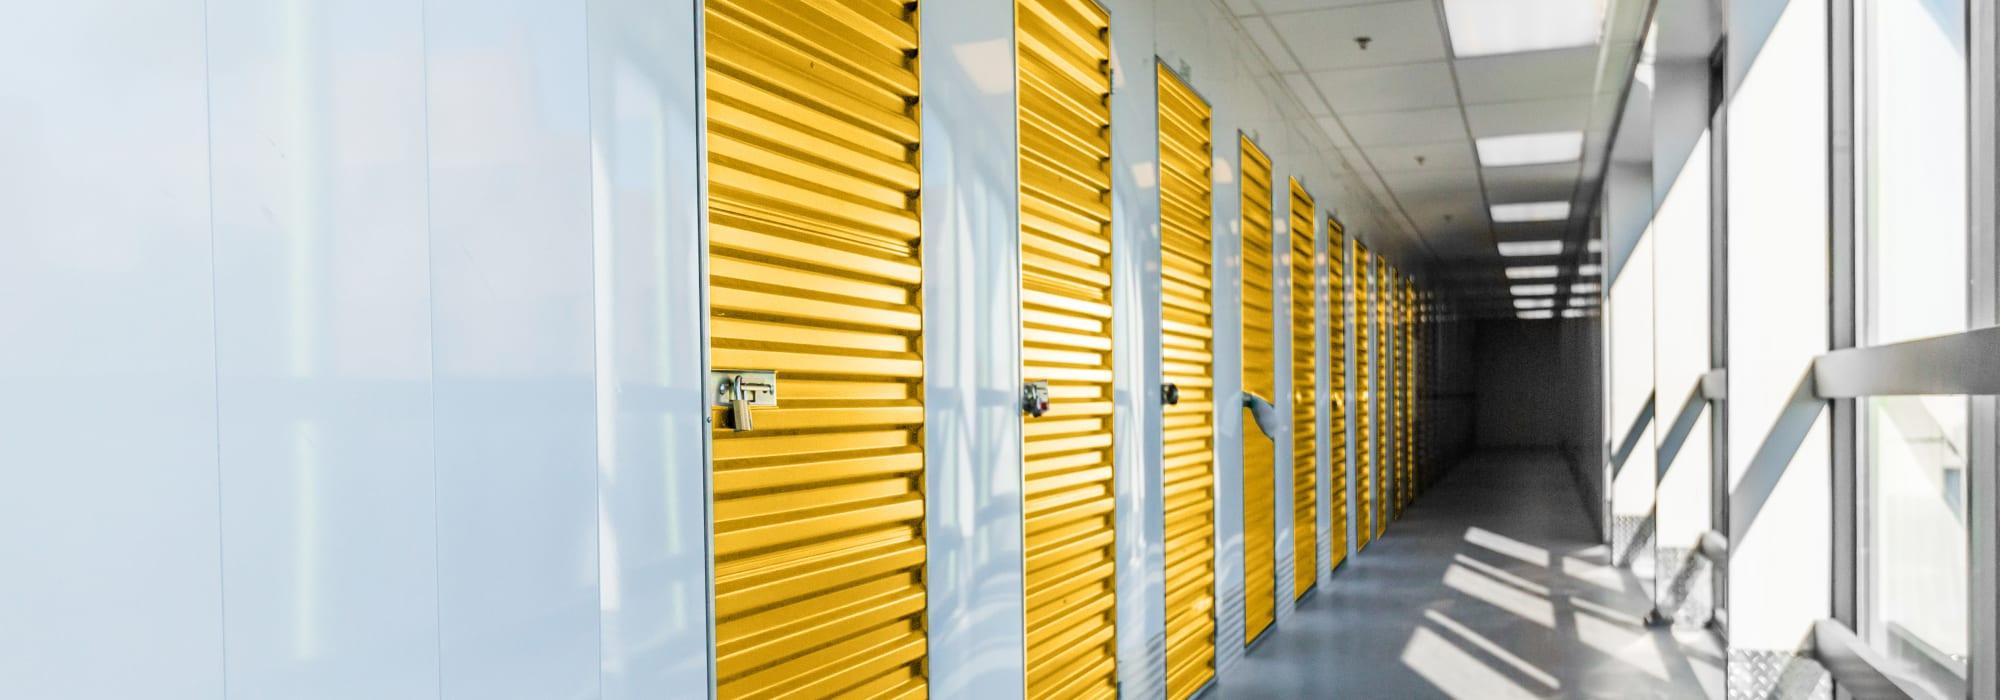 Storage 365 self storage in Arlington, Texas